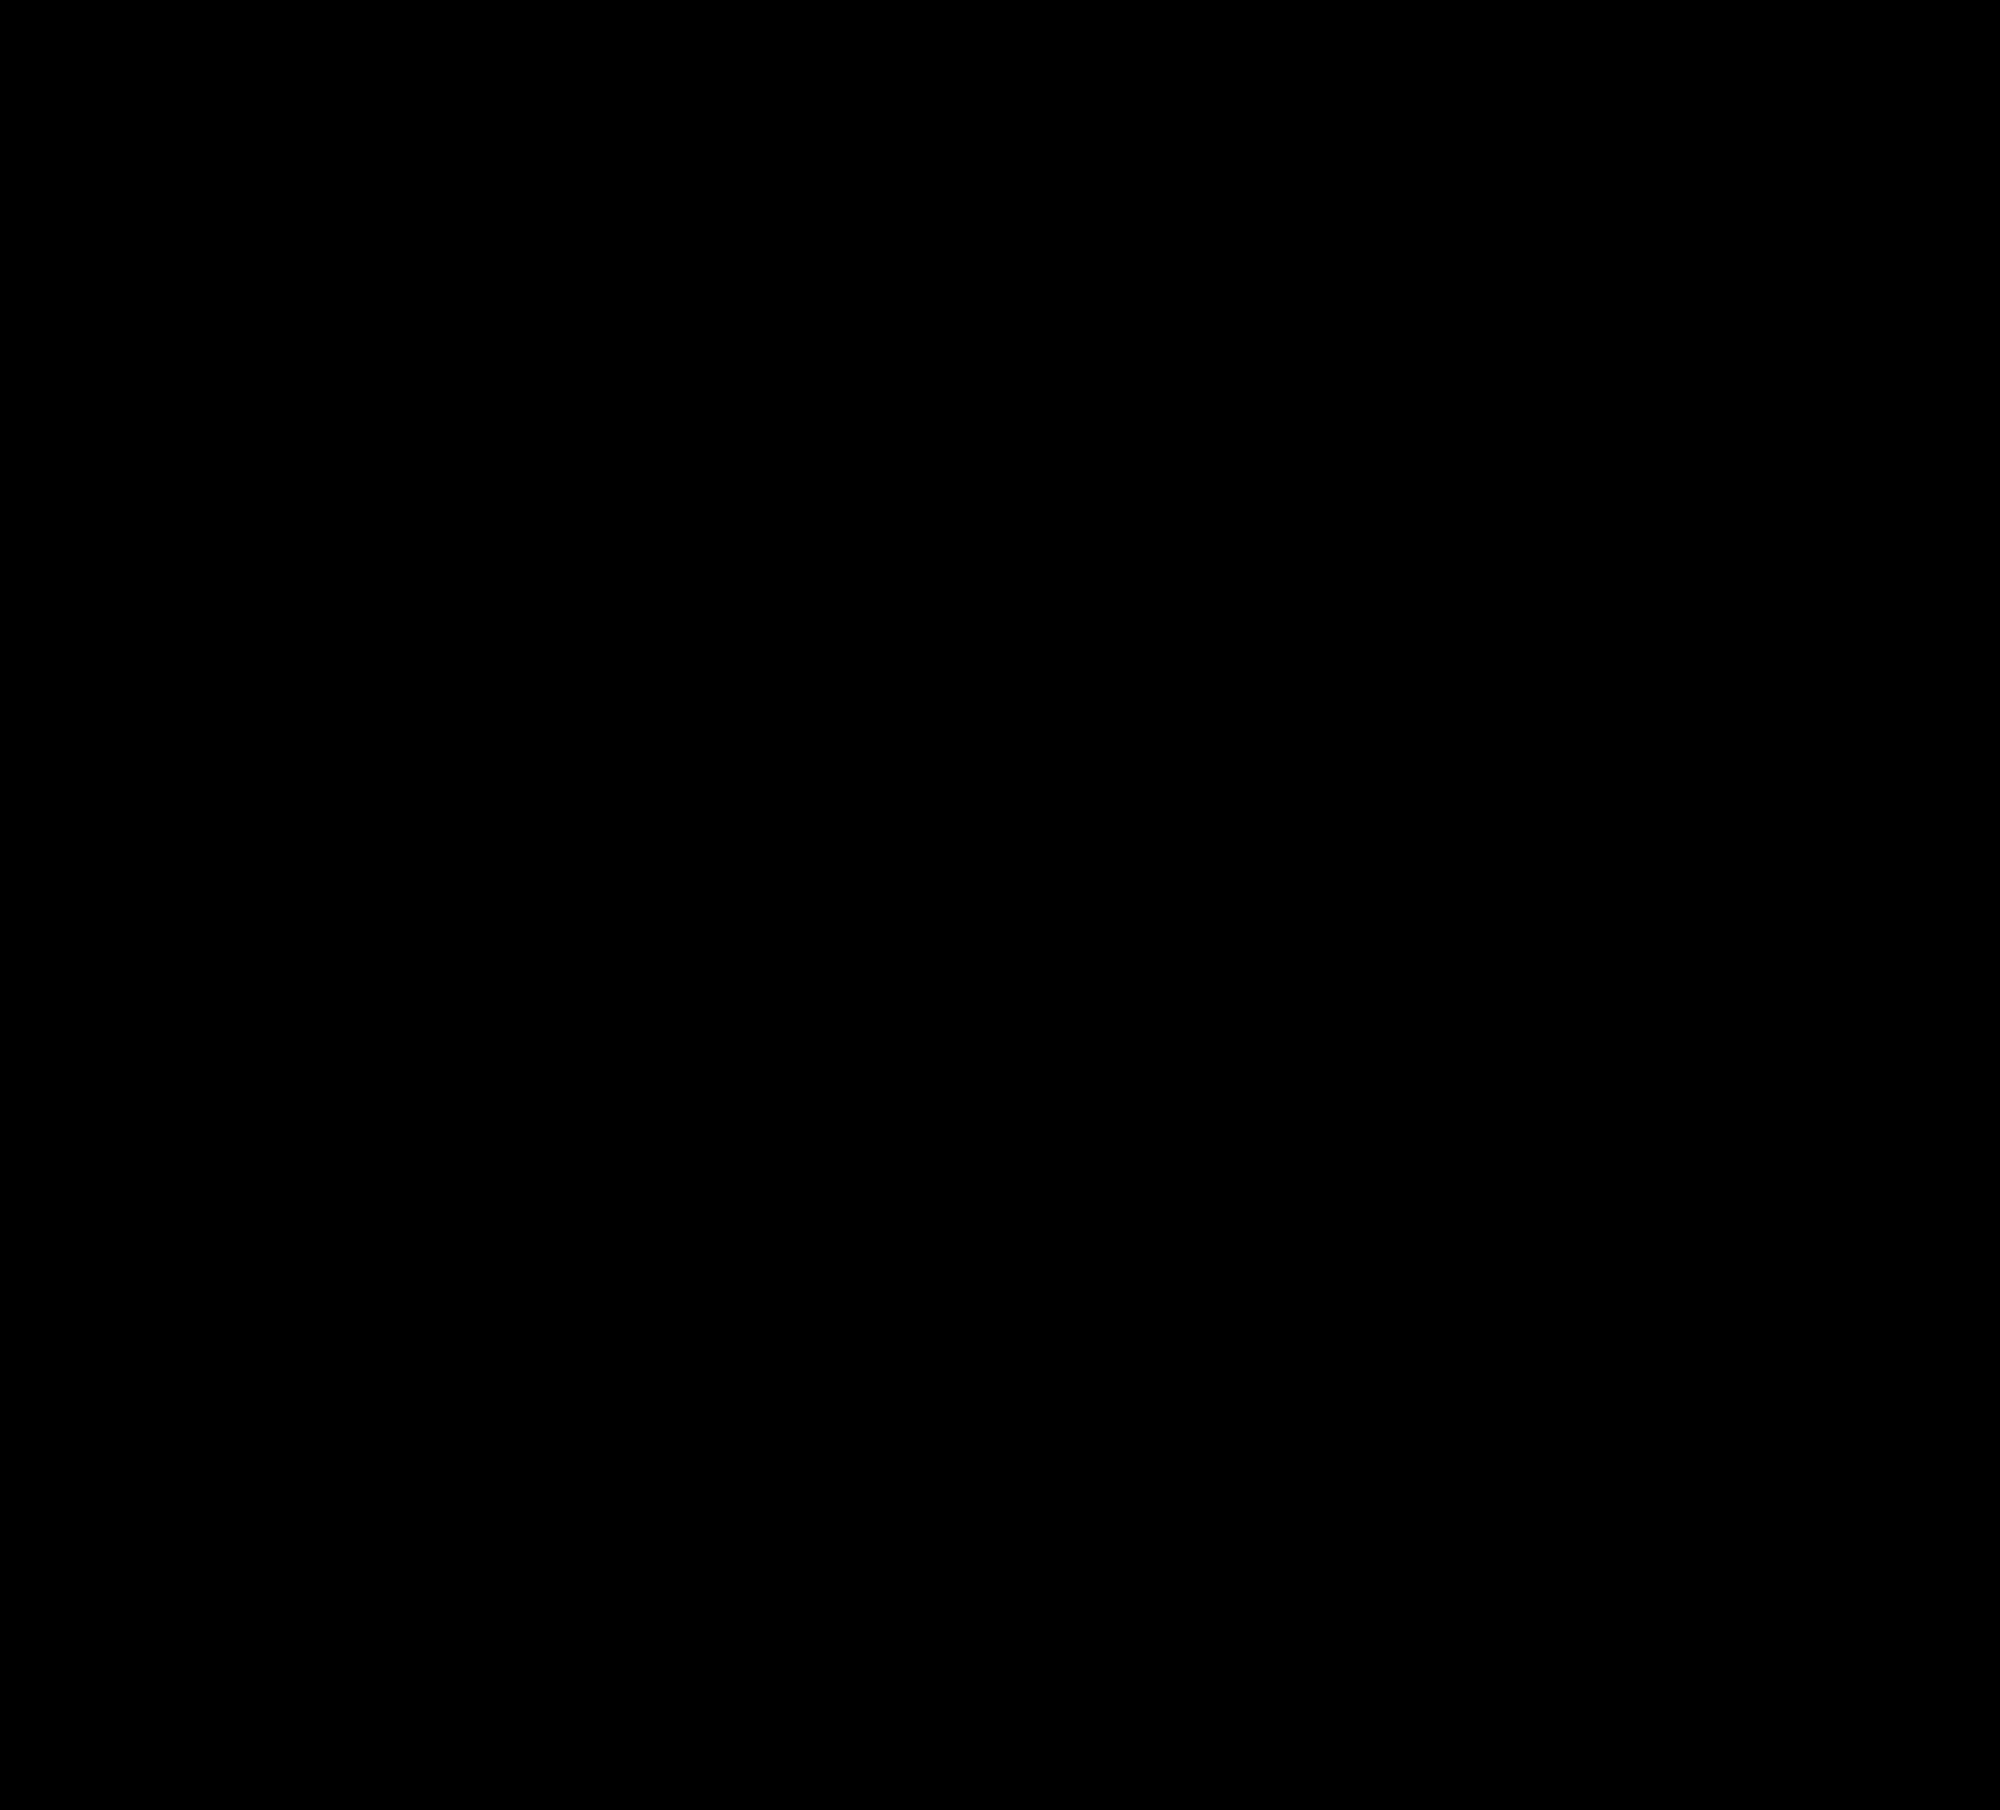 Argand plane and polar representation argument videos examples argumment pooptronica Choice Image